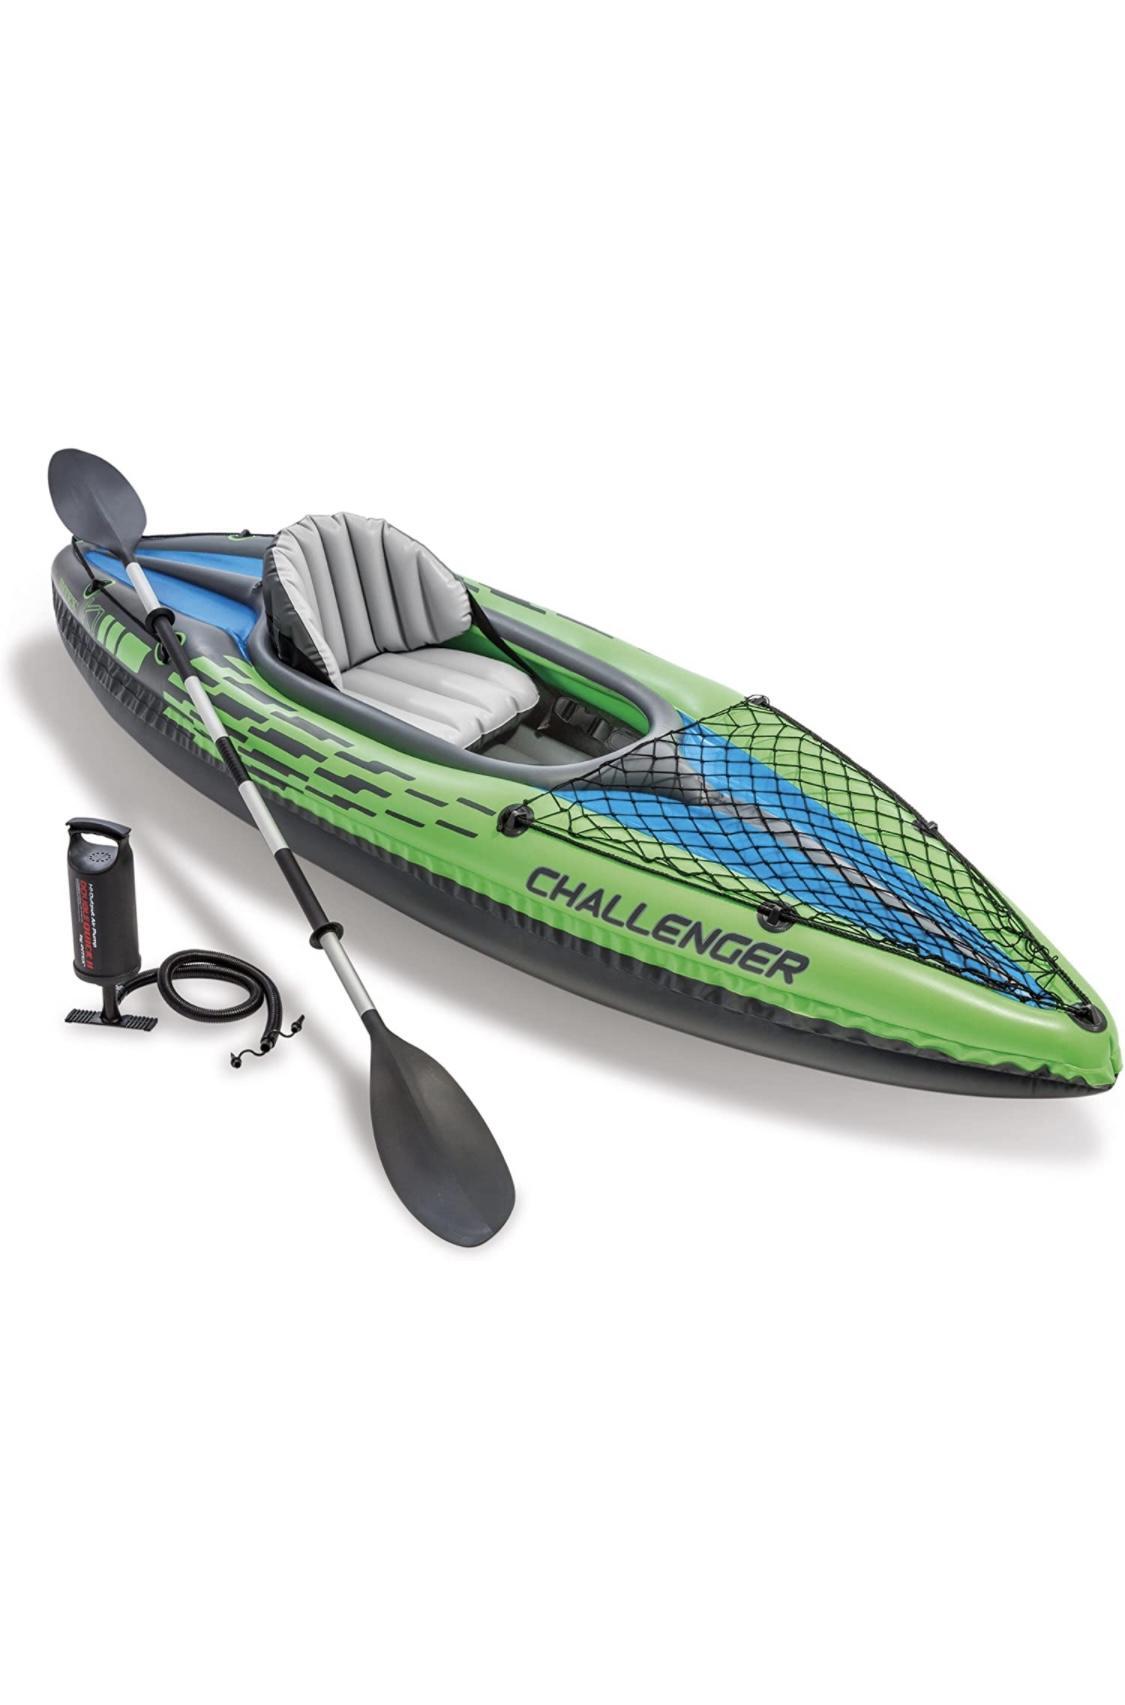 Intex Challenger Kayak Inflatable Set with Aluminu